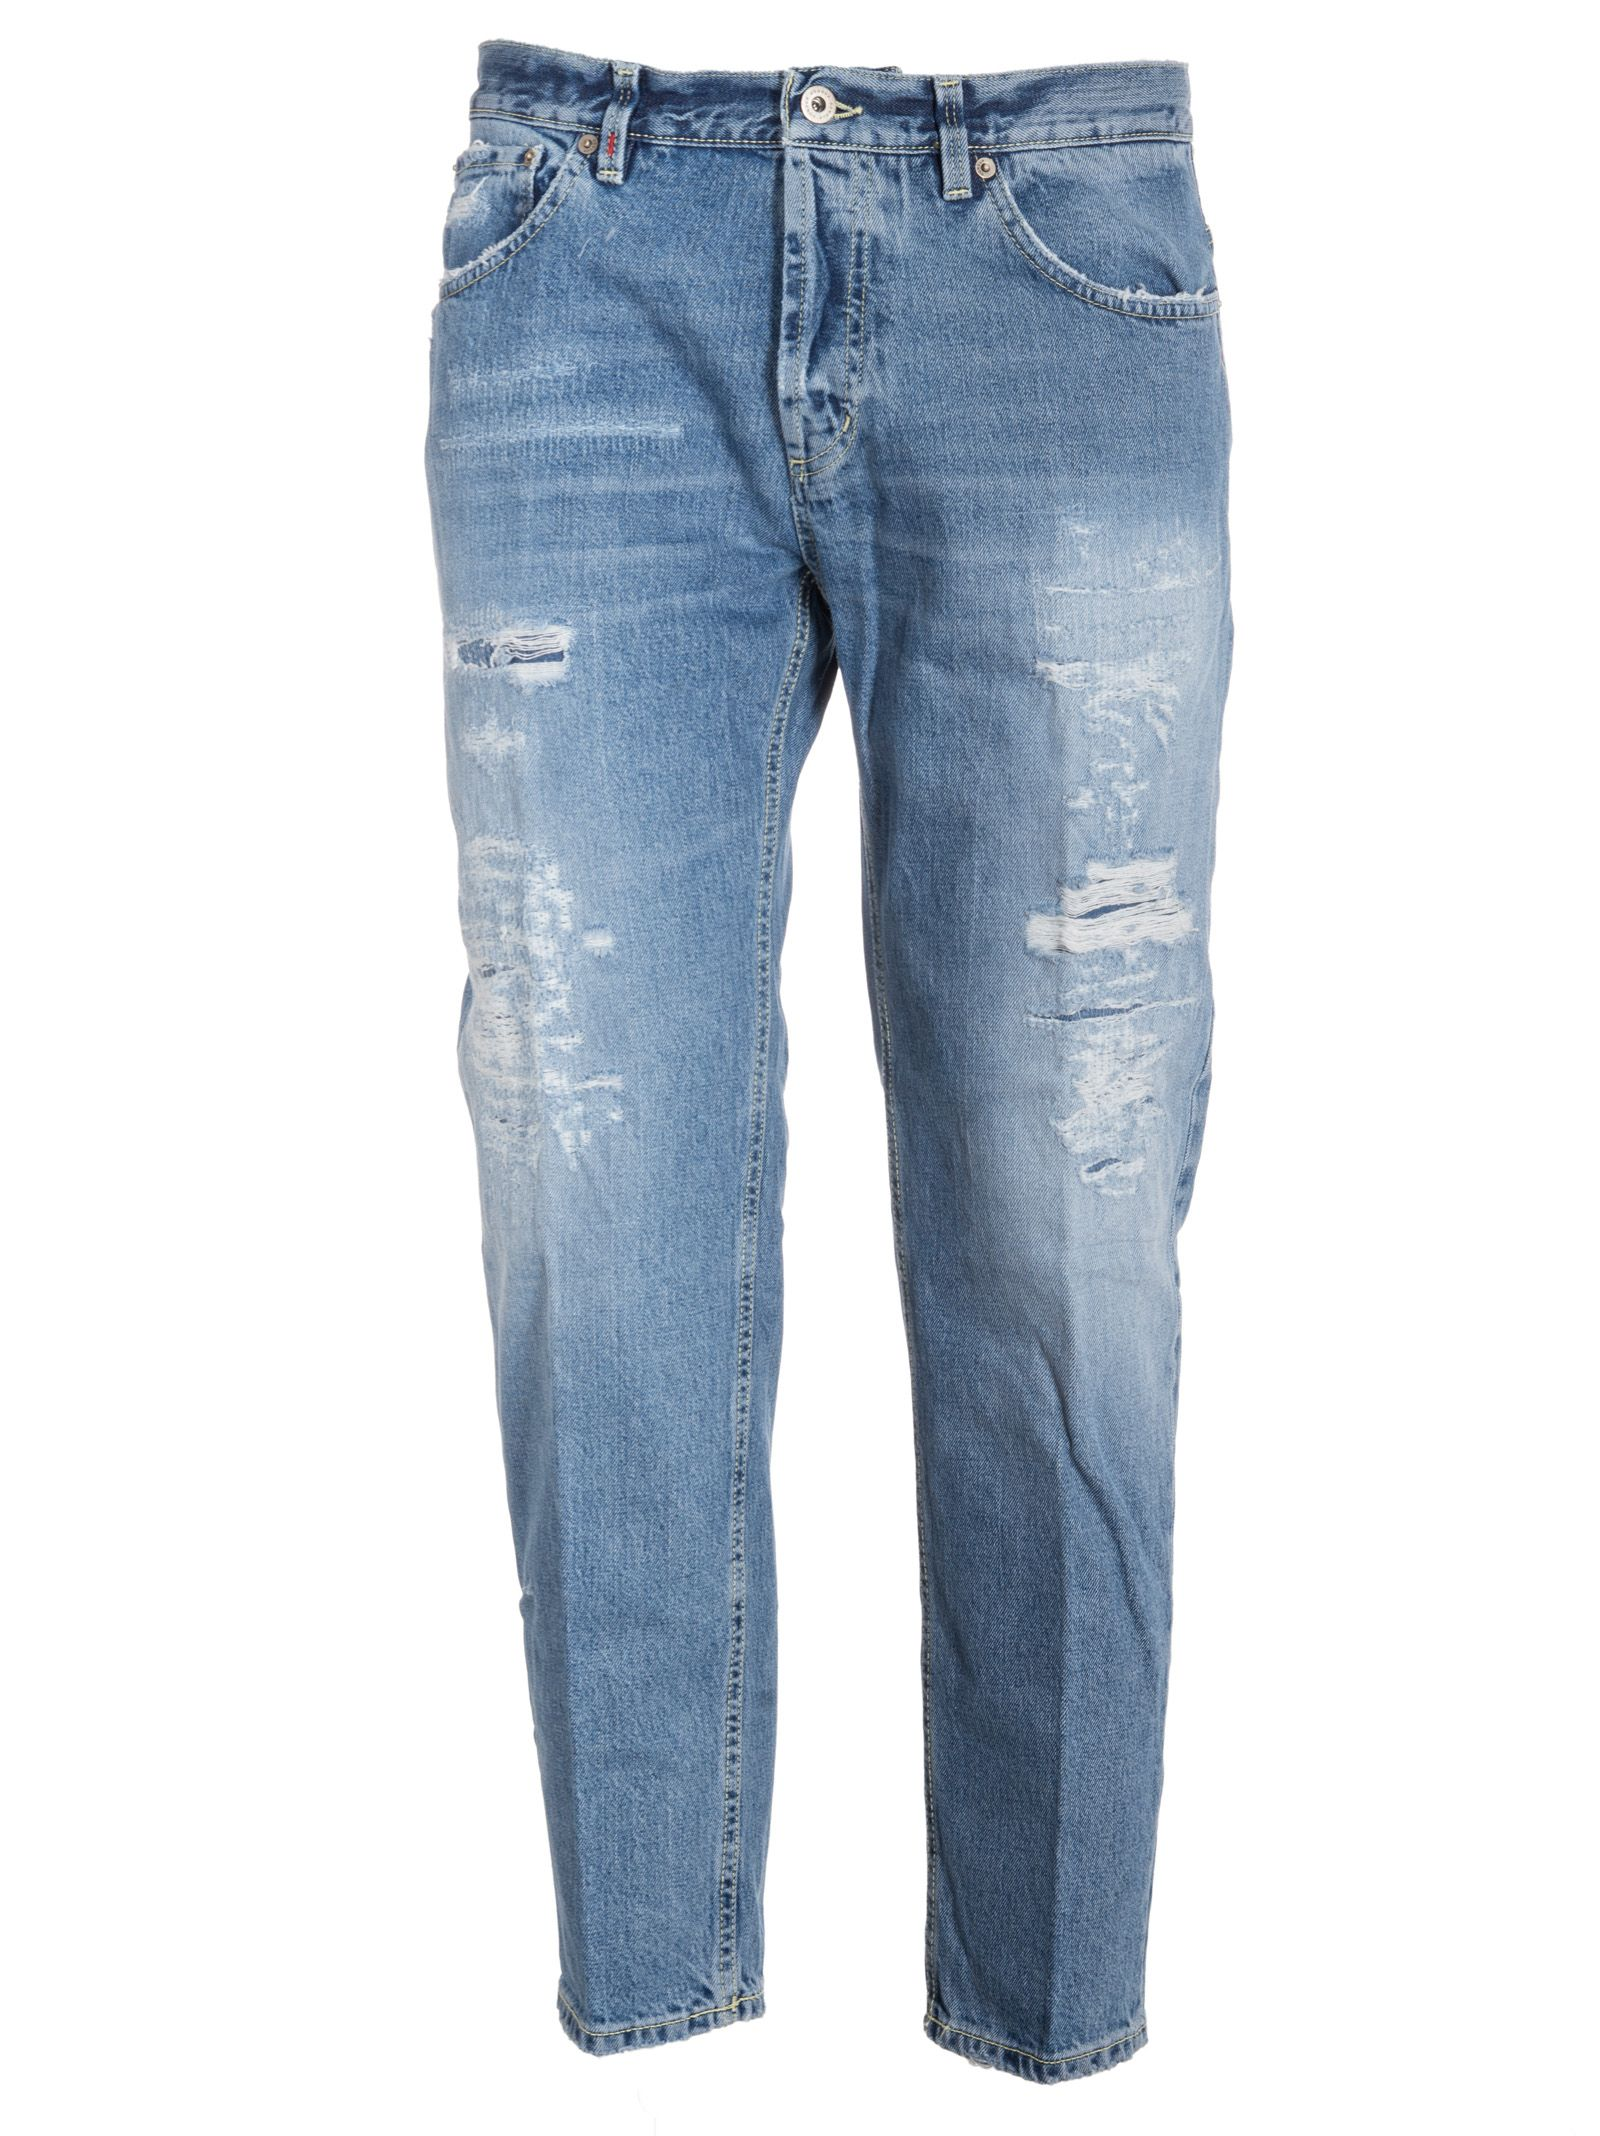 Dondup Brighton Jeans